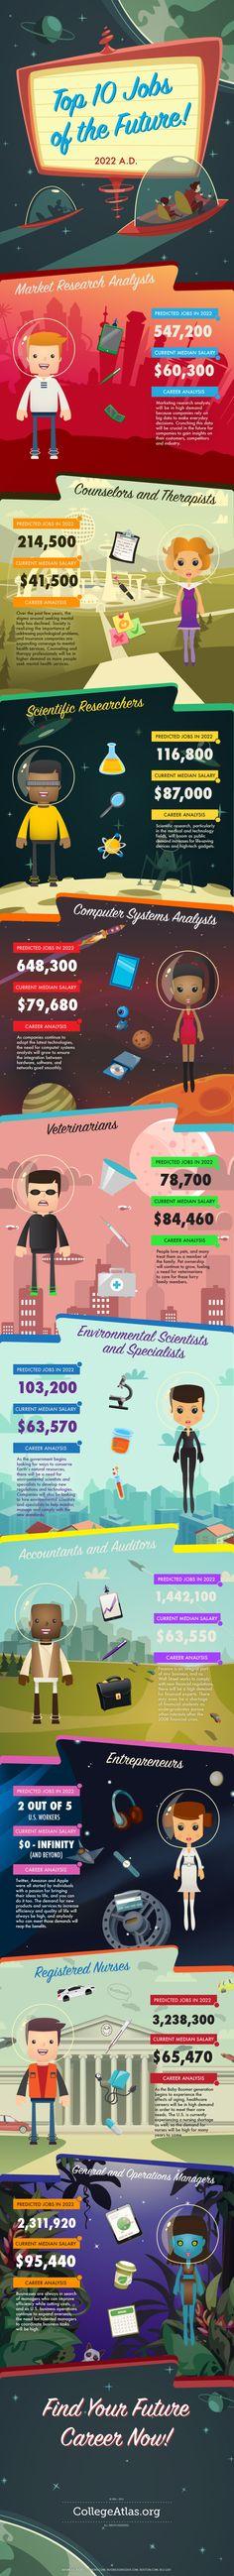 Unique Infographic Design, Top 10 Jobs Of The Future #Infographic #Design (http://www.pinterest.com/aldenchong/)